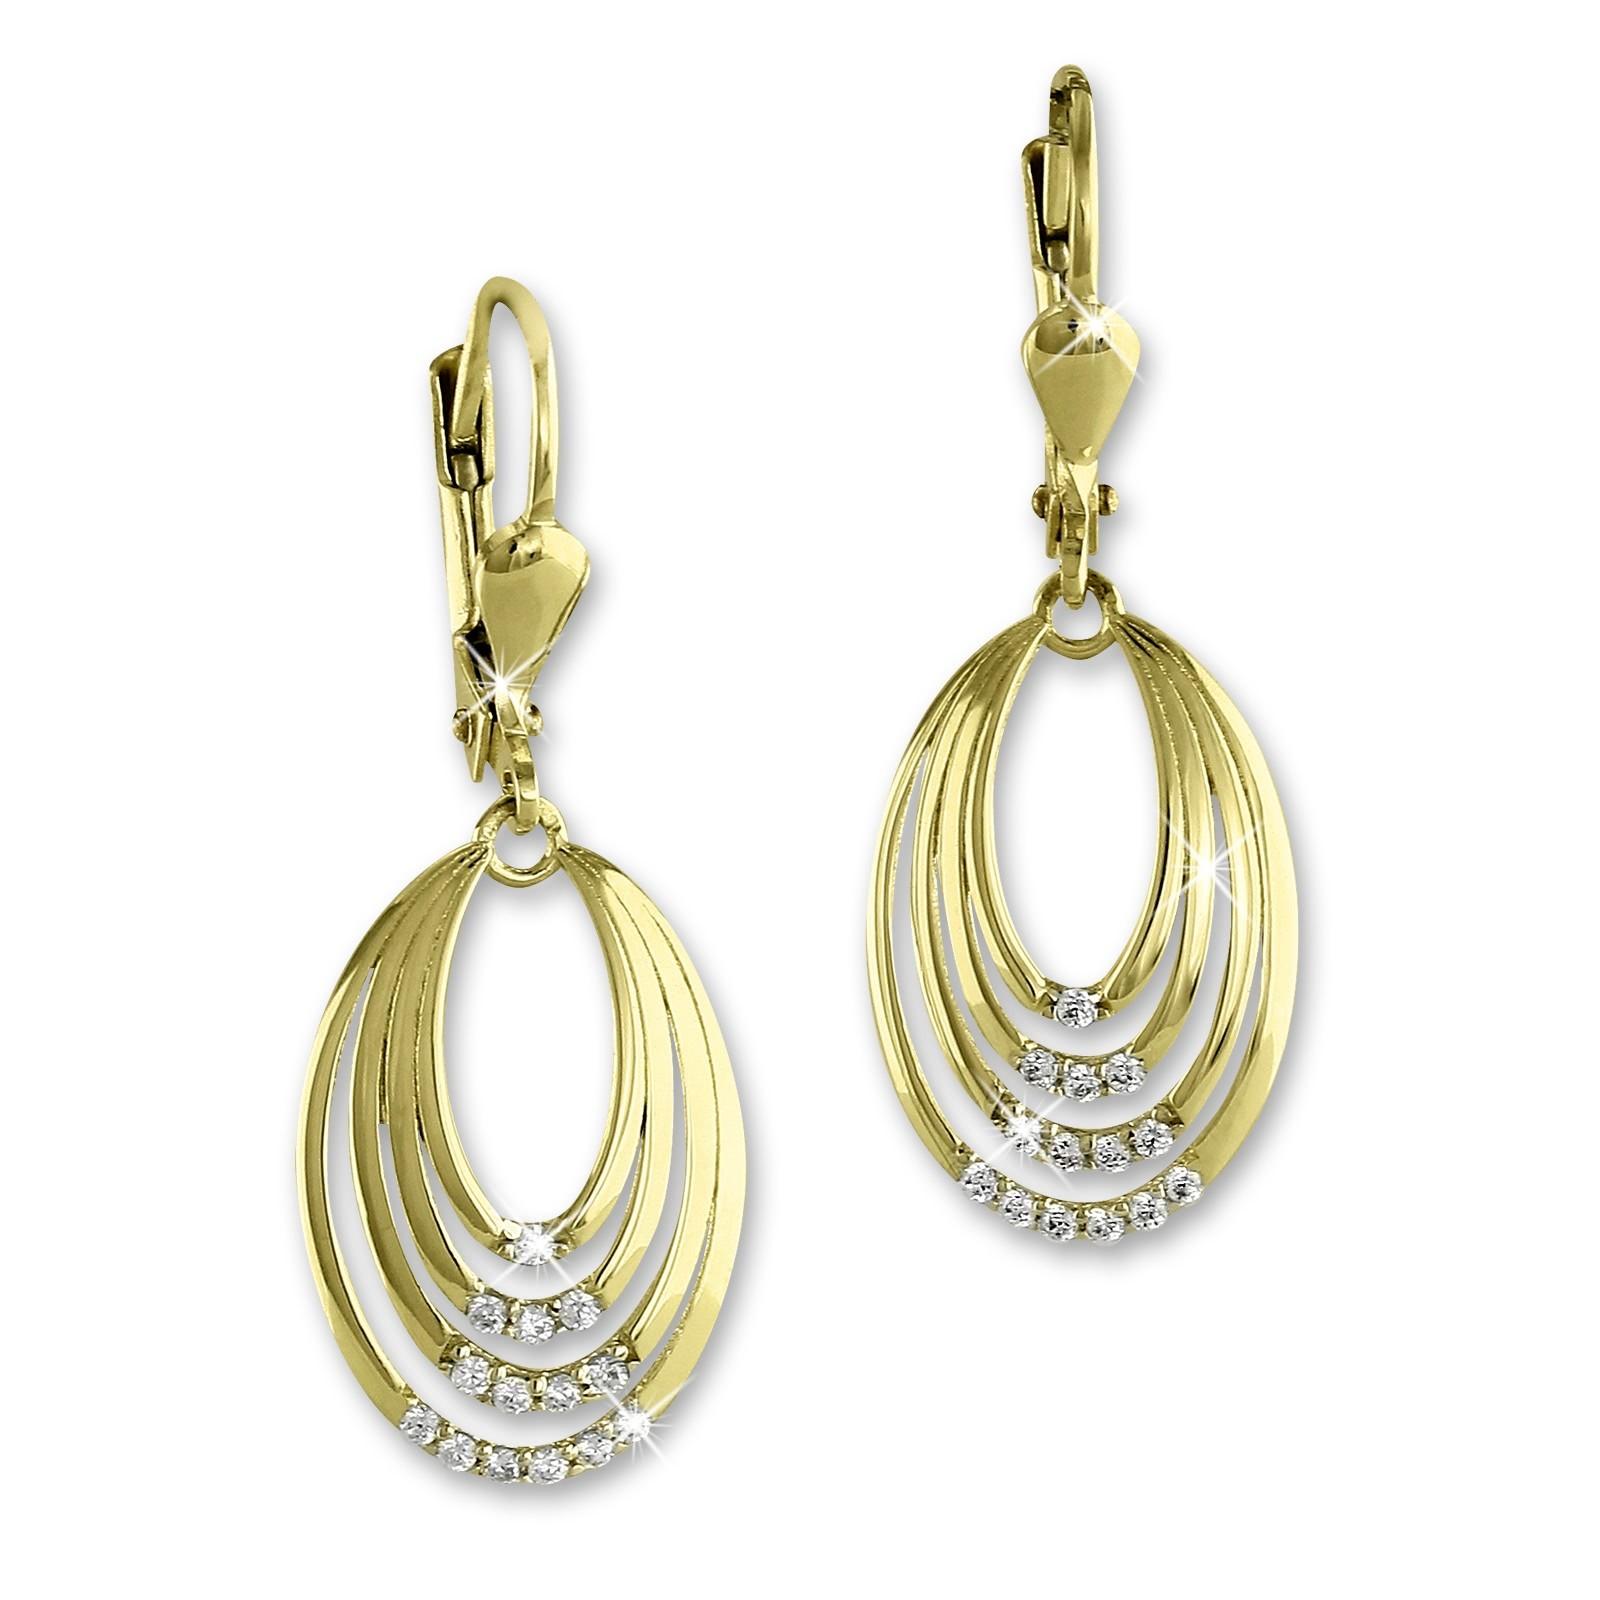 SilberDream Ohrhänger Ovale Zirkonia weiß Ohrring 333 Gold Echtschmuck GDO544WY